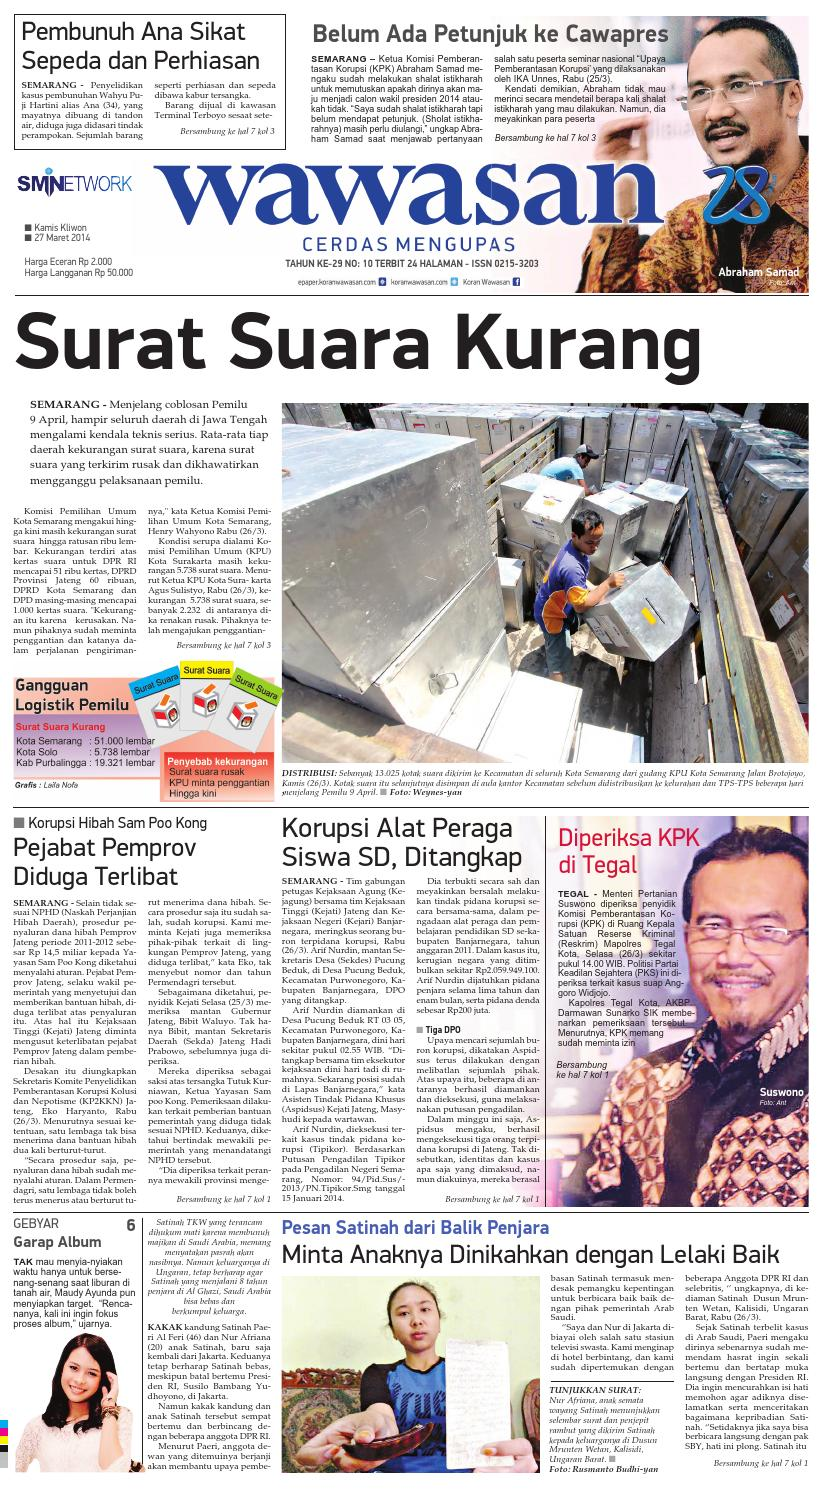 Wawasan 27 Maret 2014 By Koran Pagi Issuu Produk Ukm Bumn Dompet Double Bordir Rikaamp039s